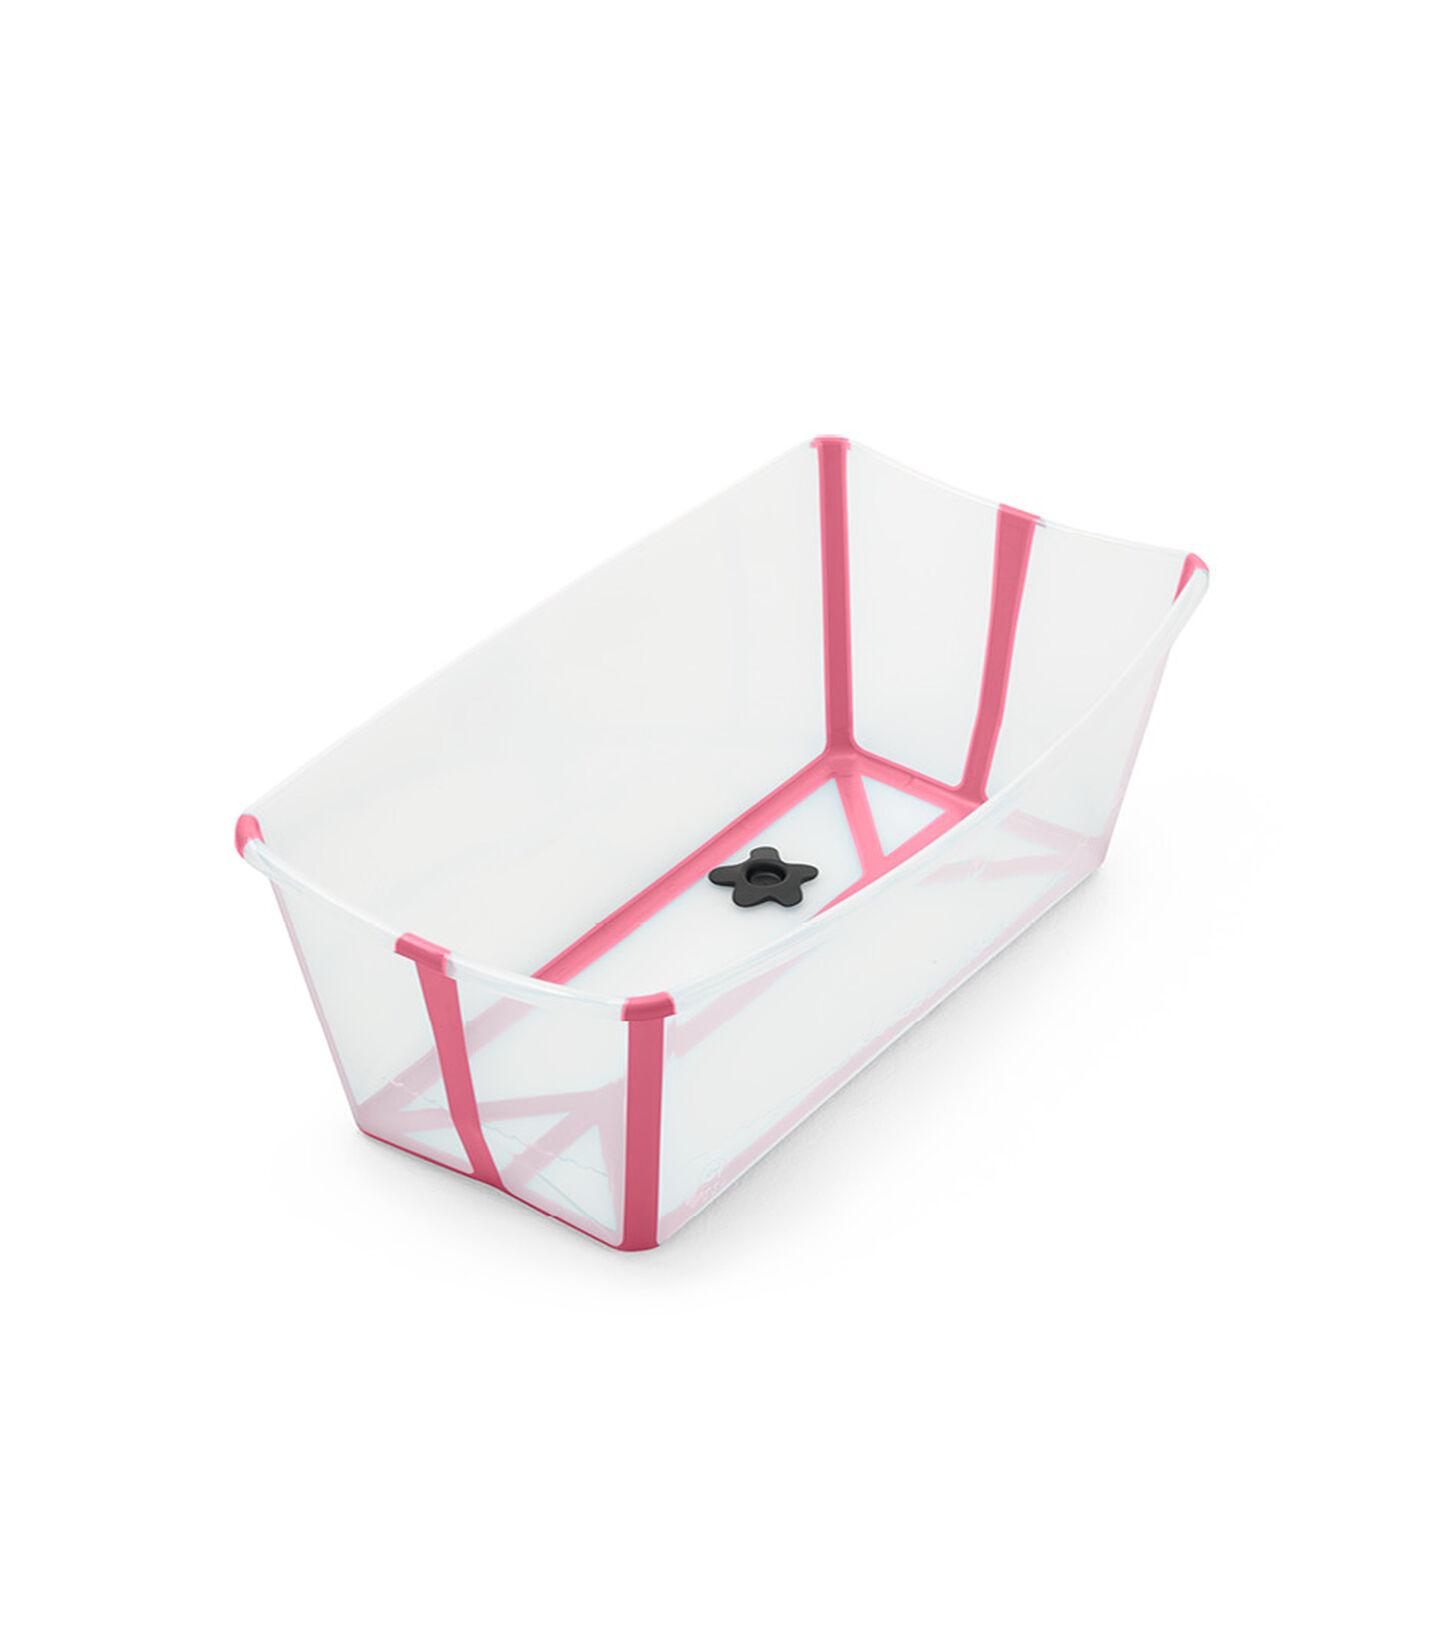 Stokke® Flexi Bath® bath tub, Transparent Pink. Open. view 2